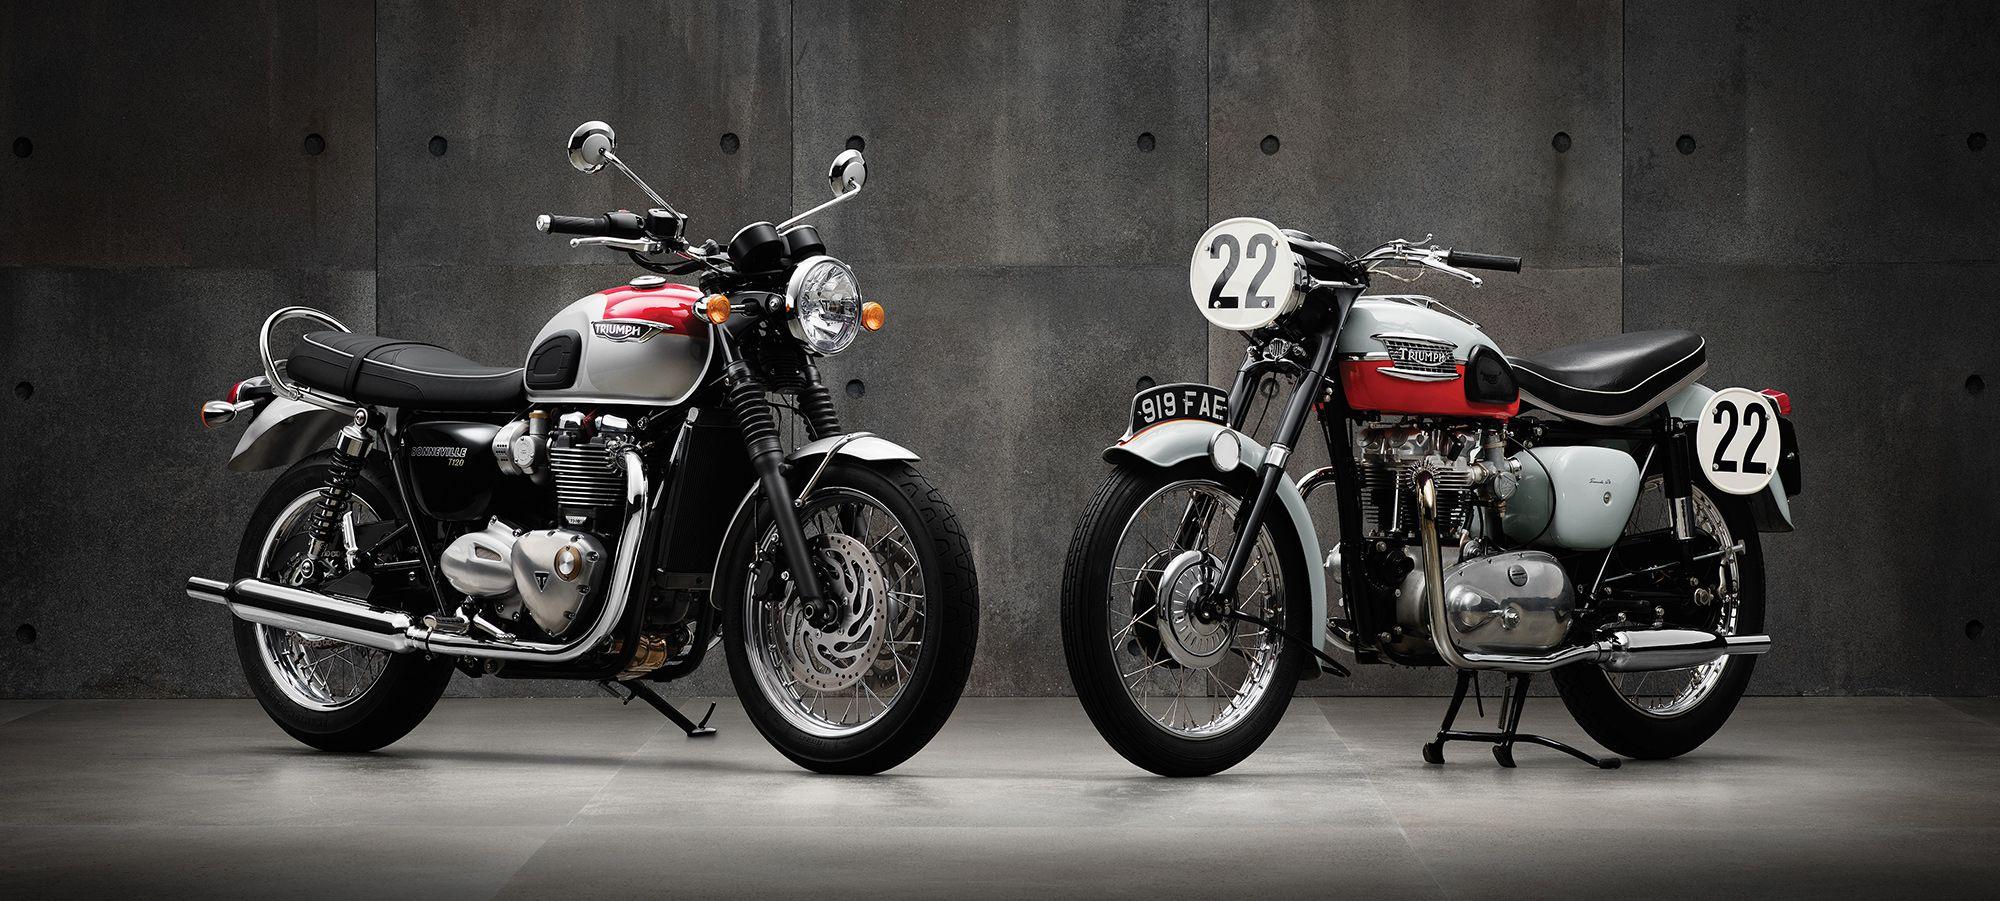 The Triumph Bonnevillecool Is Only The Beginning Motorcyclist